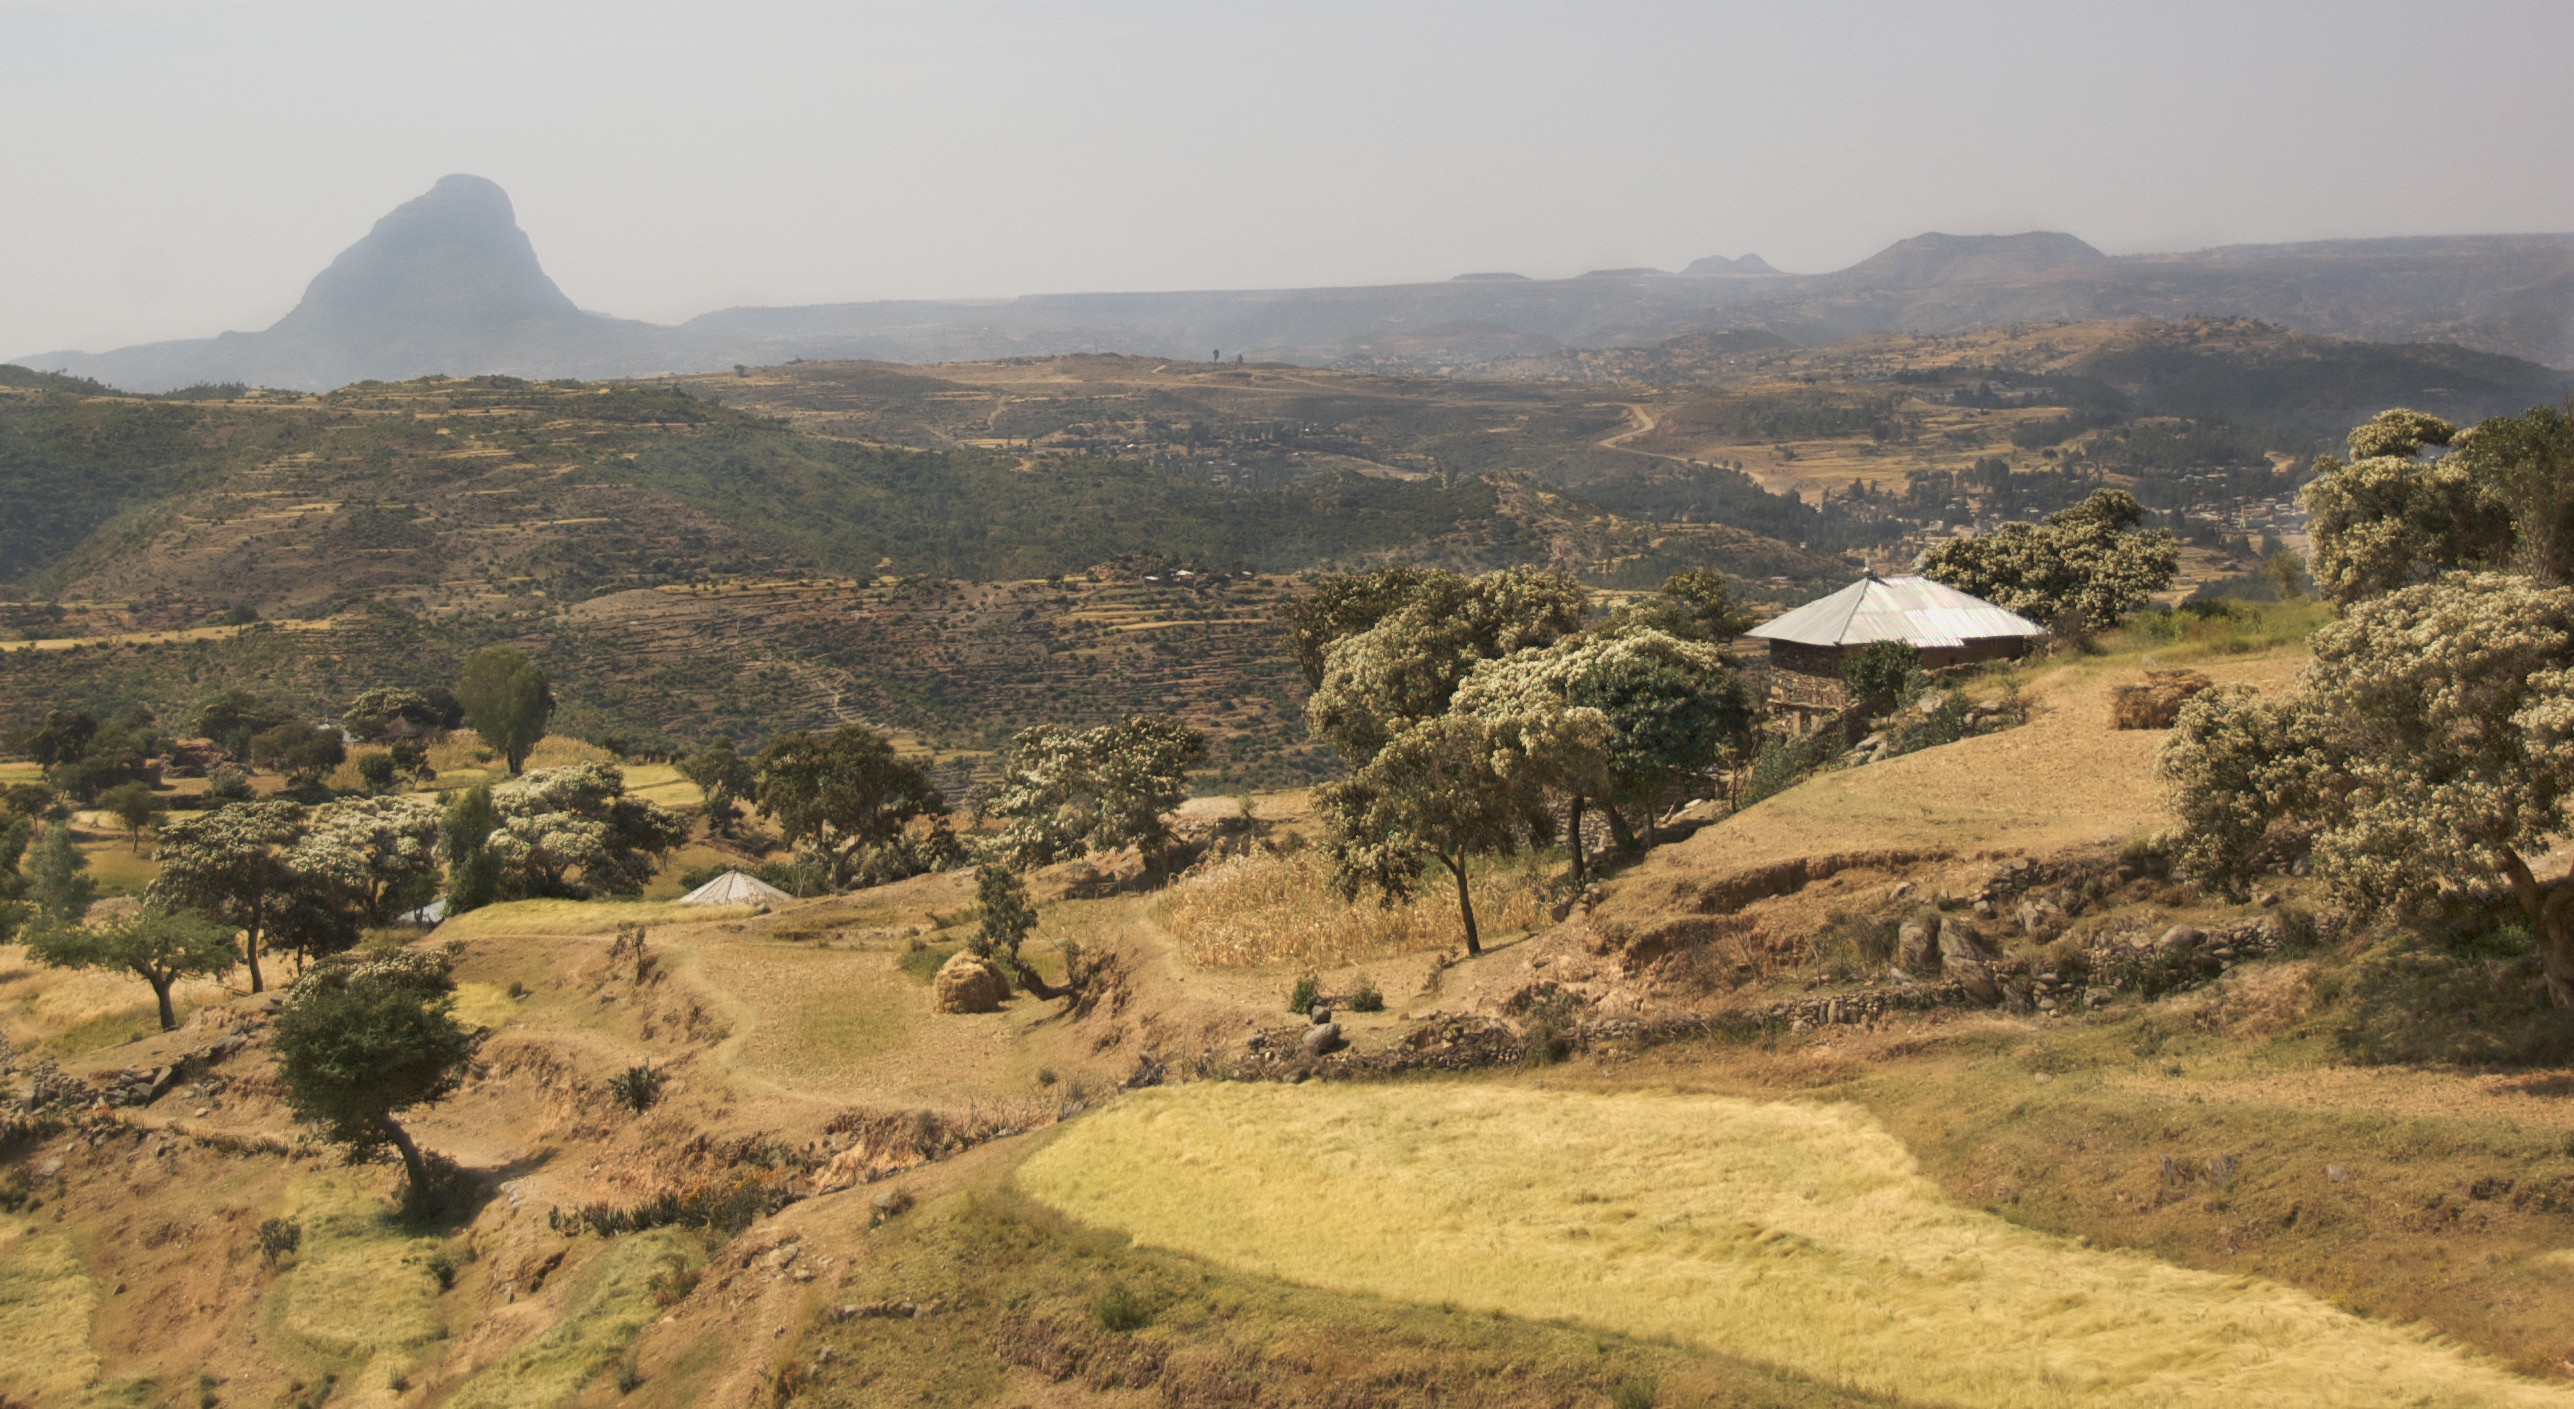 Free ethiopia tourists dating sites